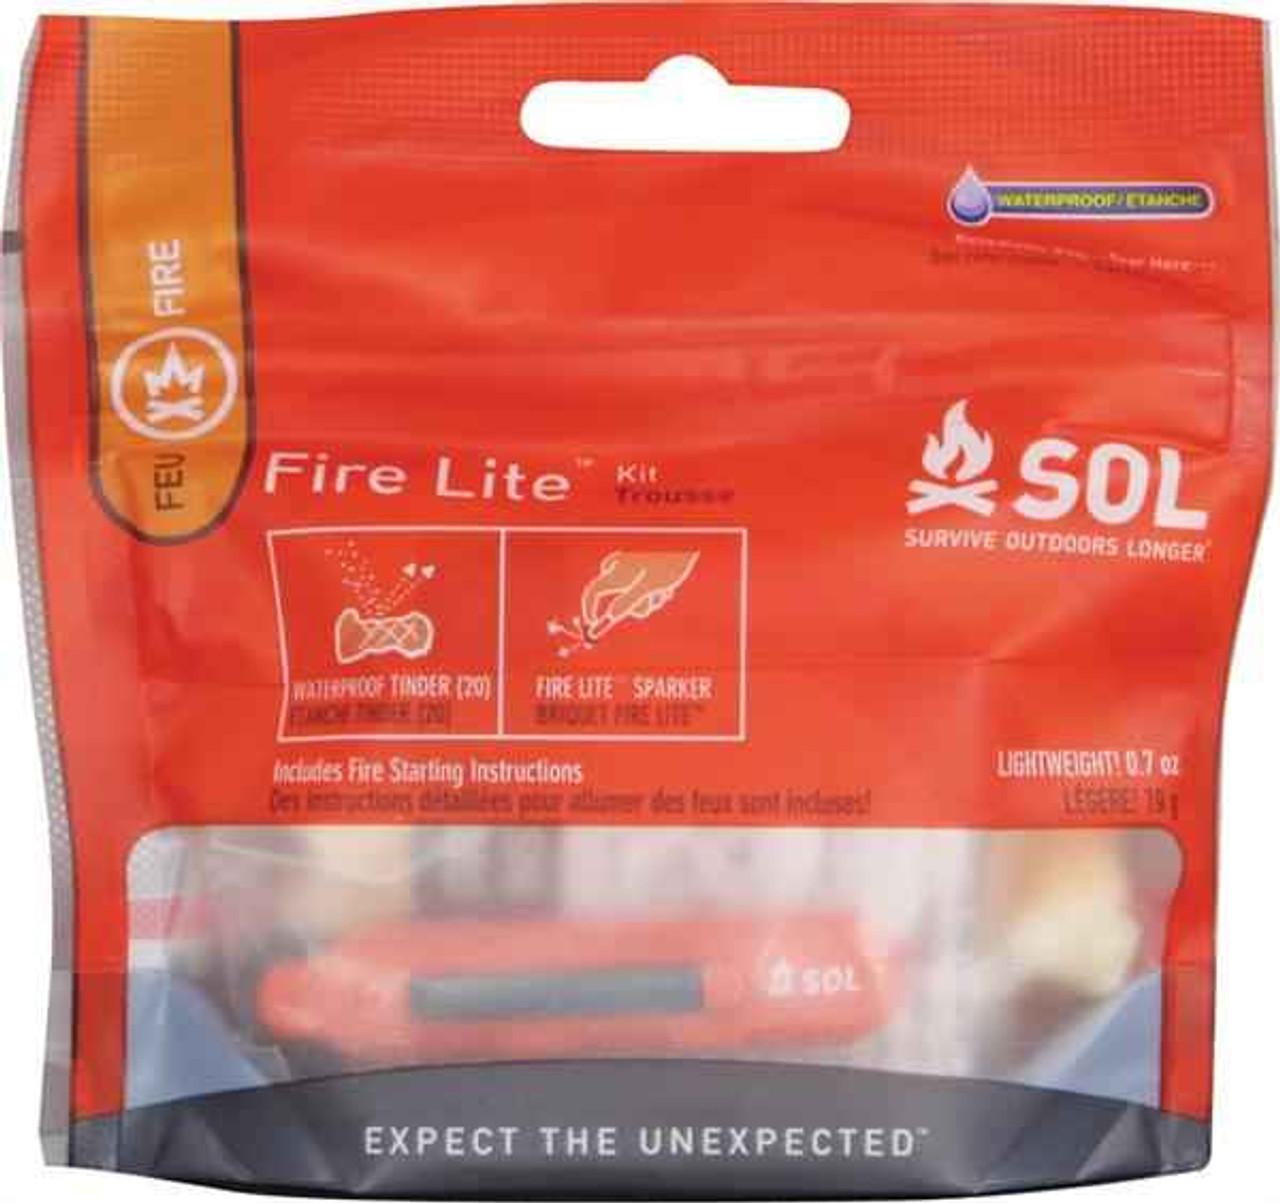 Adventure AD1230 Medical SOL Fire Lite Kit